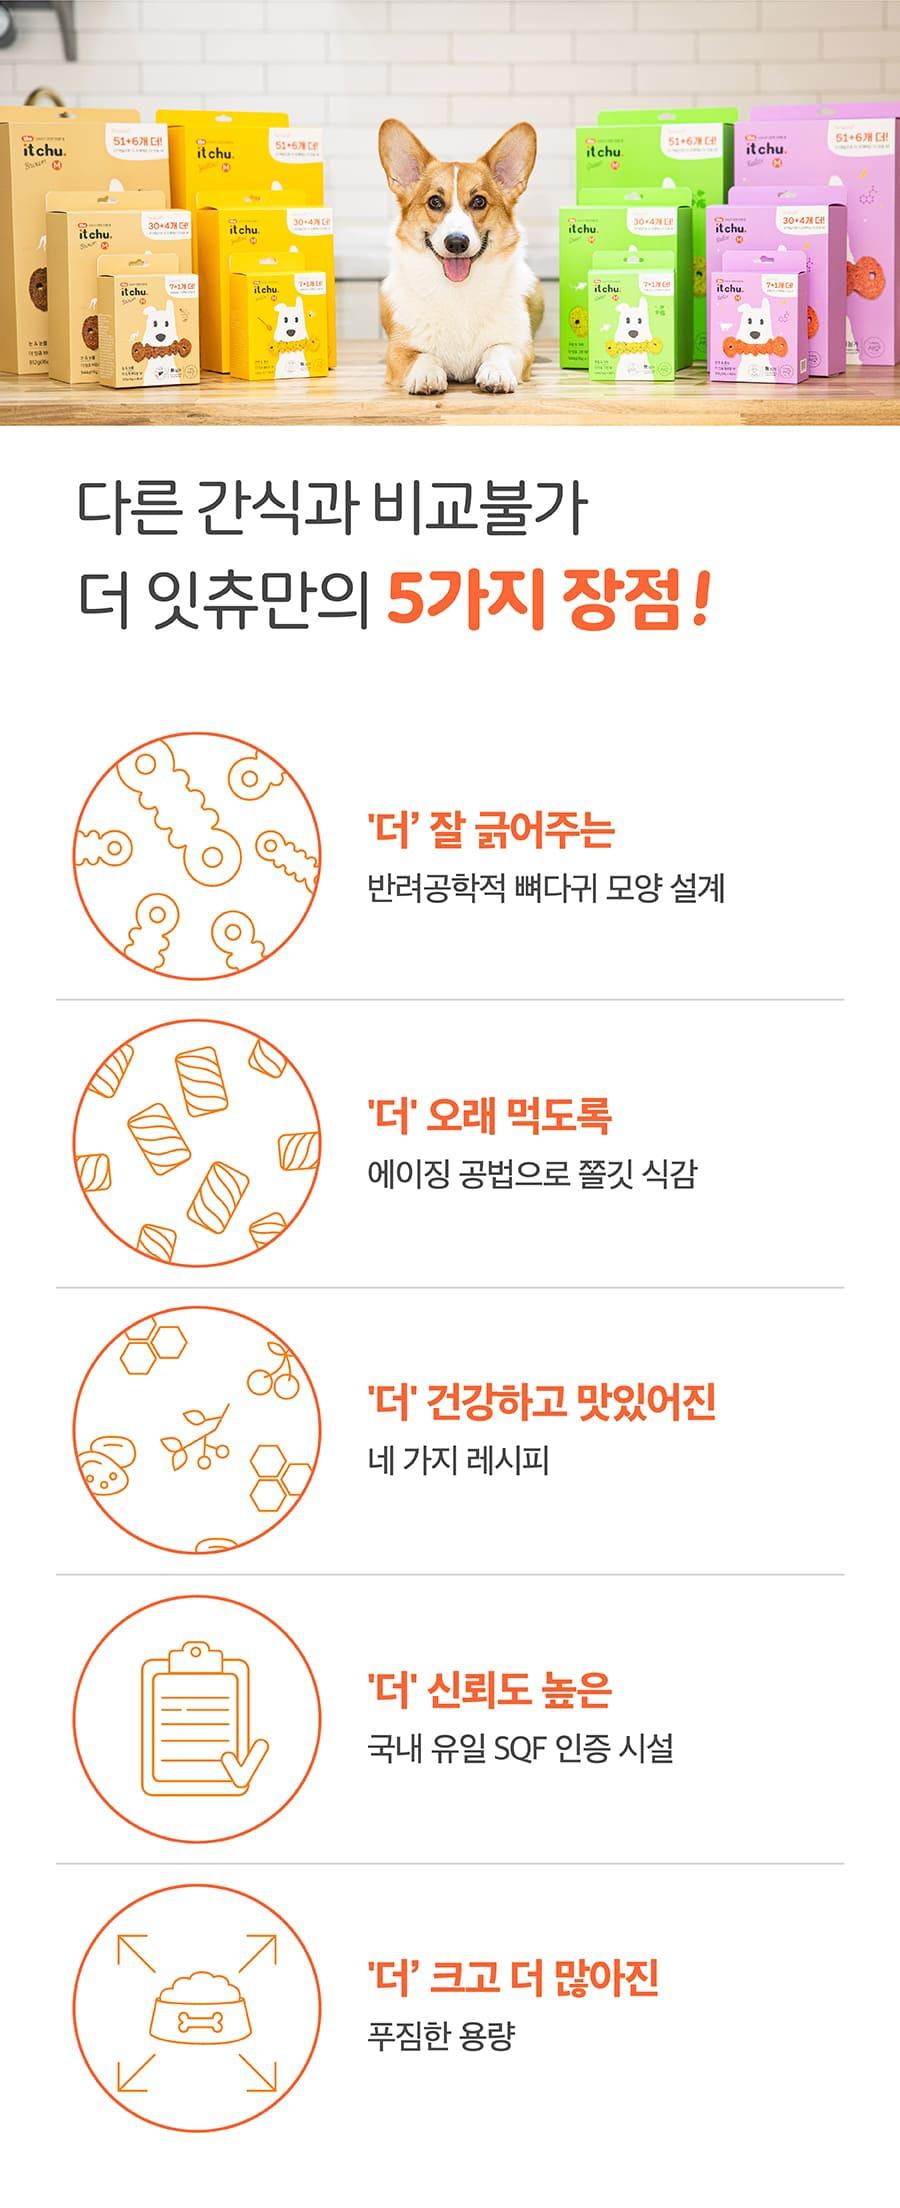 [EVENT] it 더 잇츄 옐로우 M (8개입)-상품이미지-5